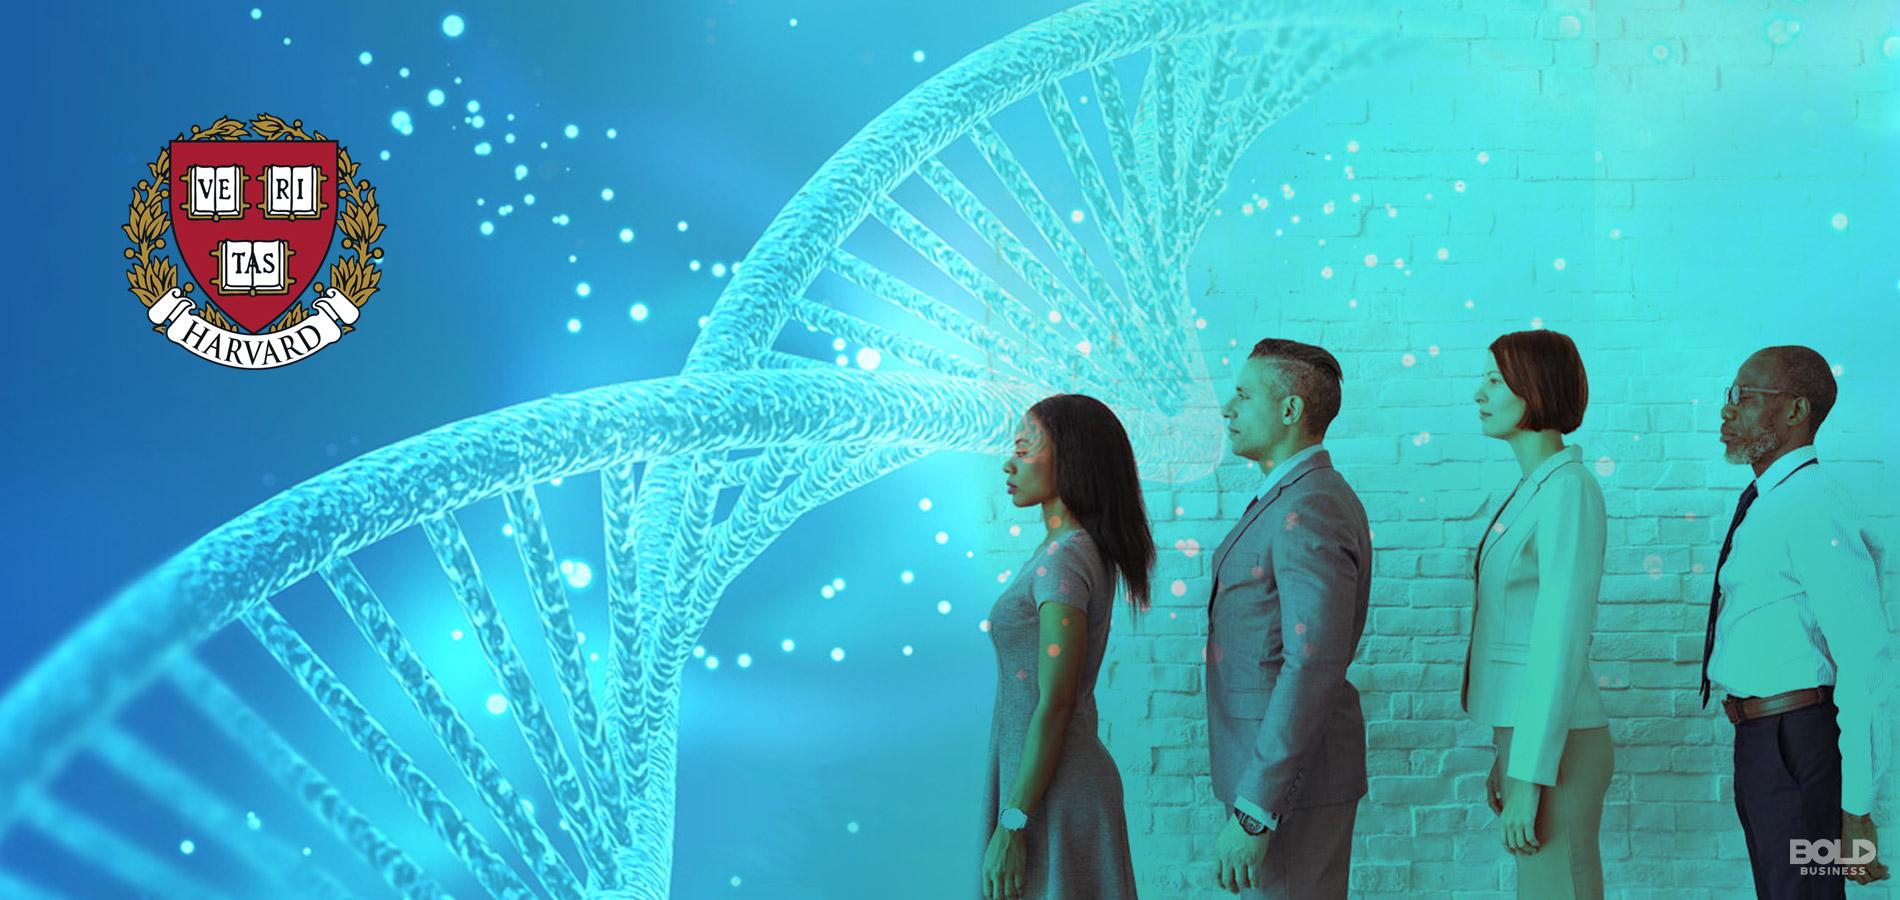 Impacts of Genes